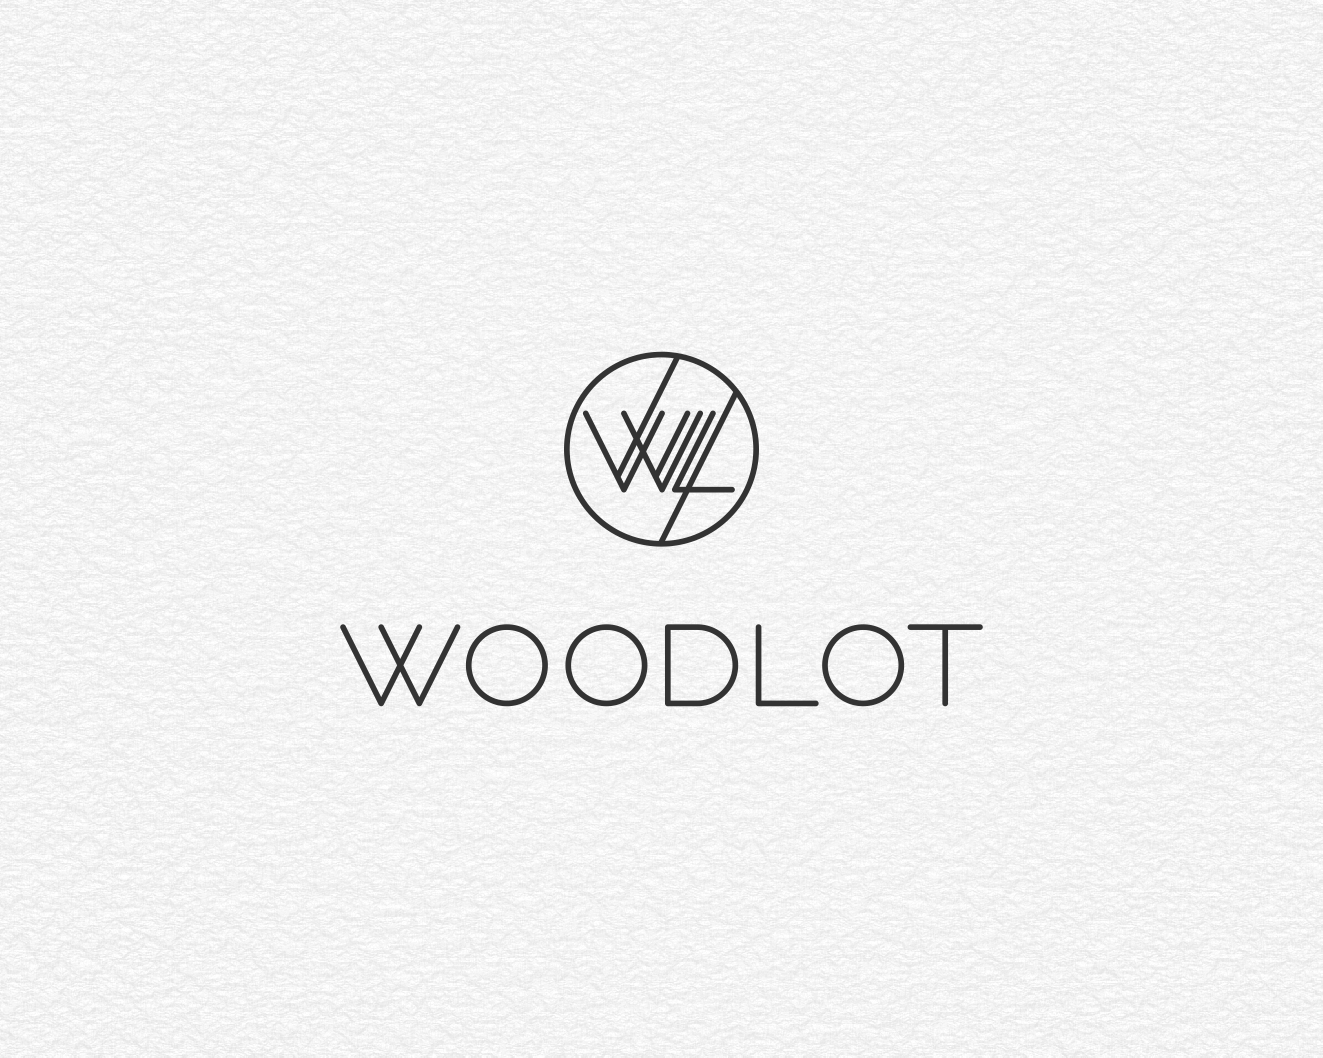 Logo Design by Rares.Andrei - Entry No. 51 in the Logo Design Contest Fun Logo Design for woodlot.